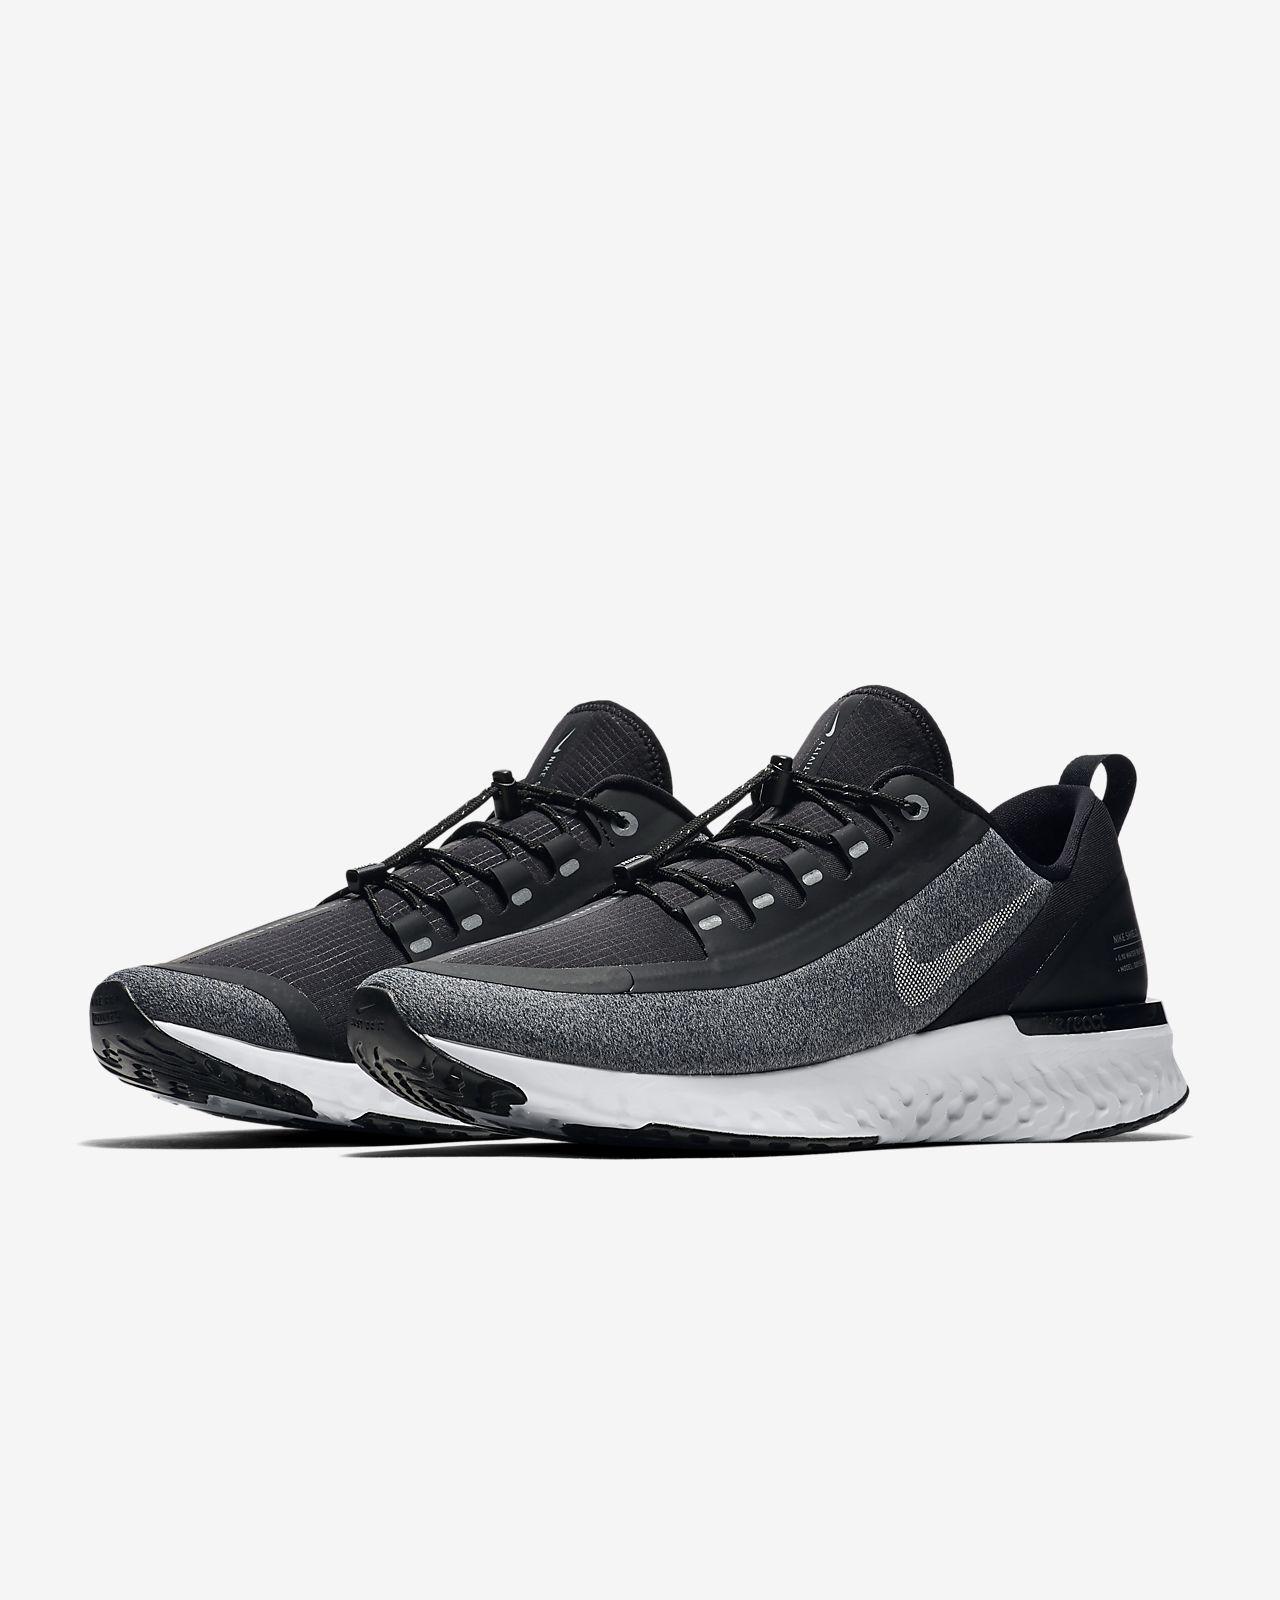 4fe90ad8478 Nike Odyssey React Shield Water-Repellent Men s Running Shoe. Nike ...